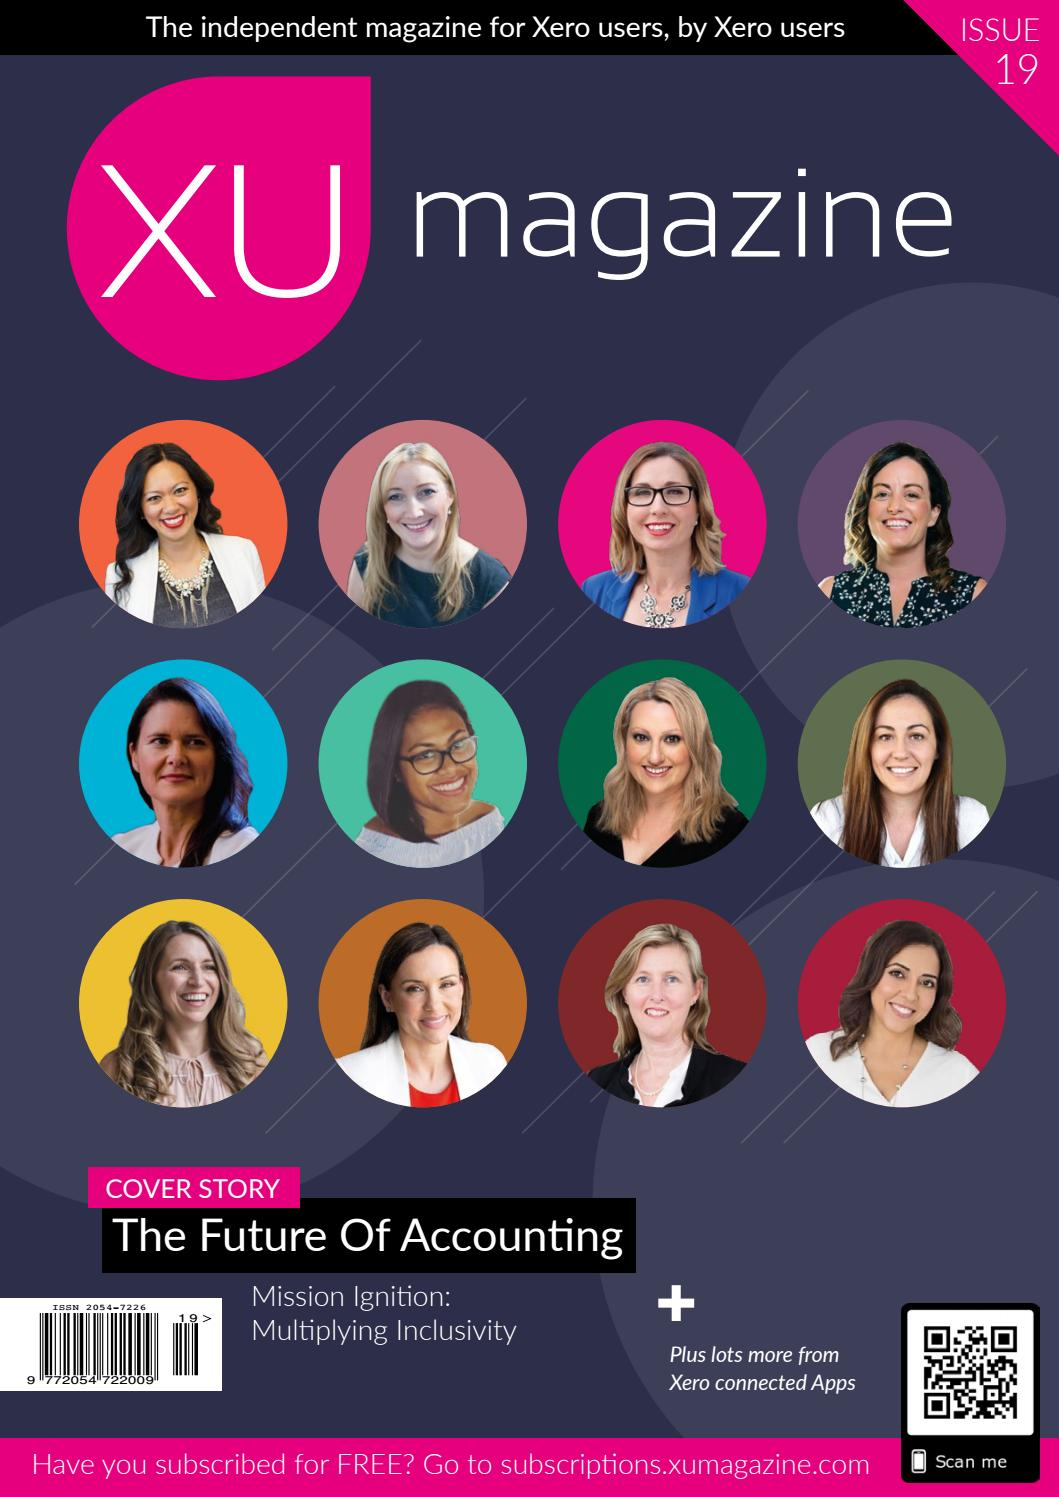 XU Magazine - Issue 19 by XU Magazine - issuu